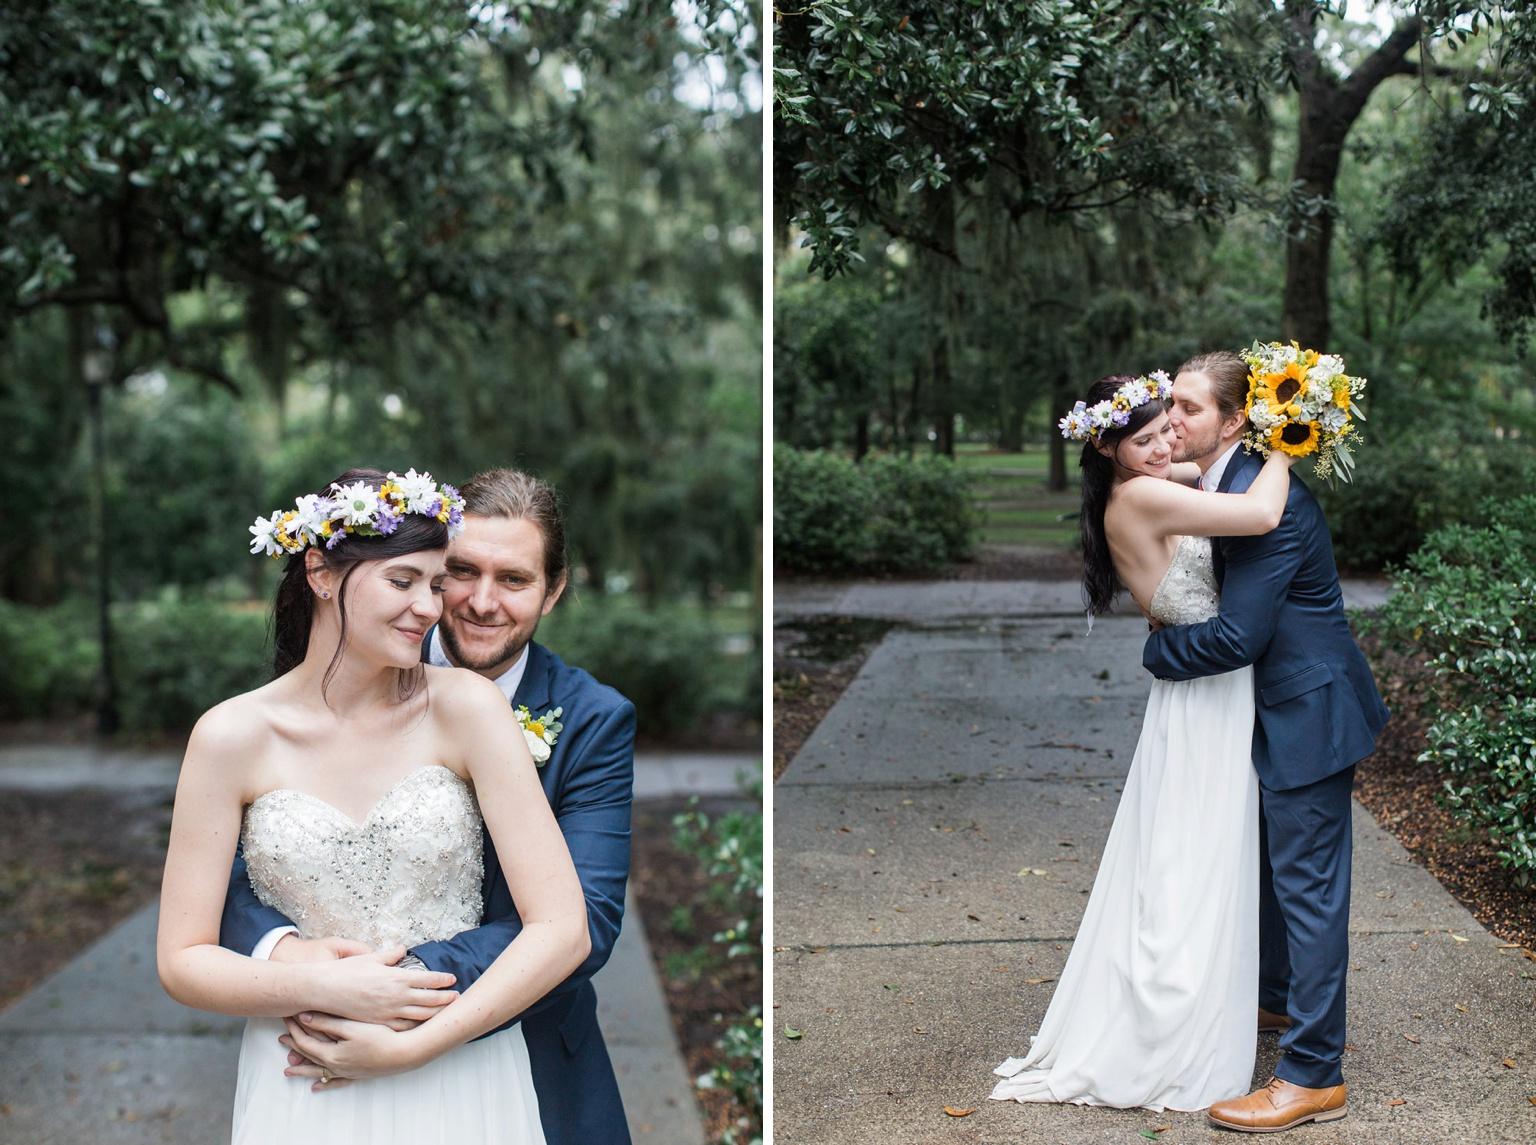 Apt_B_Photo_Savannah_Wedding_Photographer_Flower_Crown052.JPG